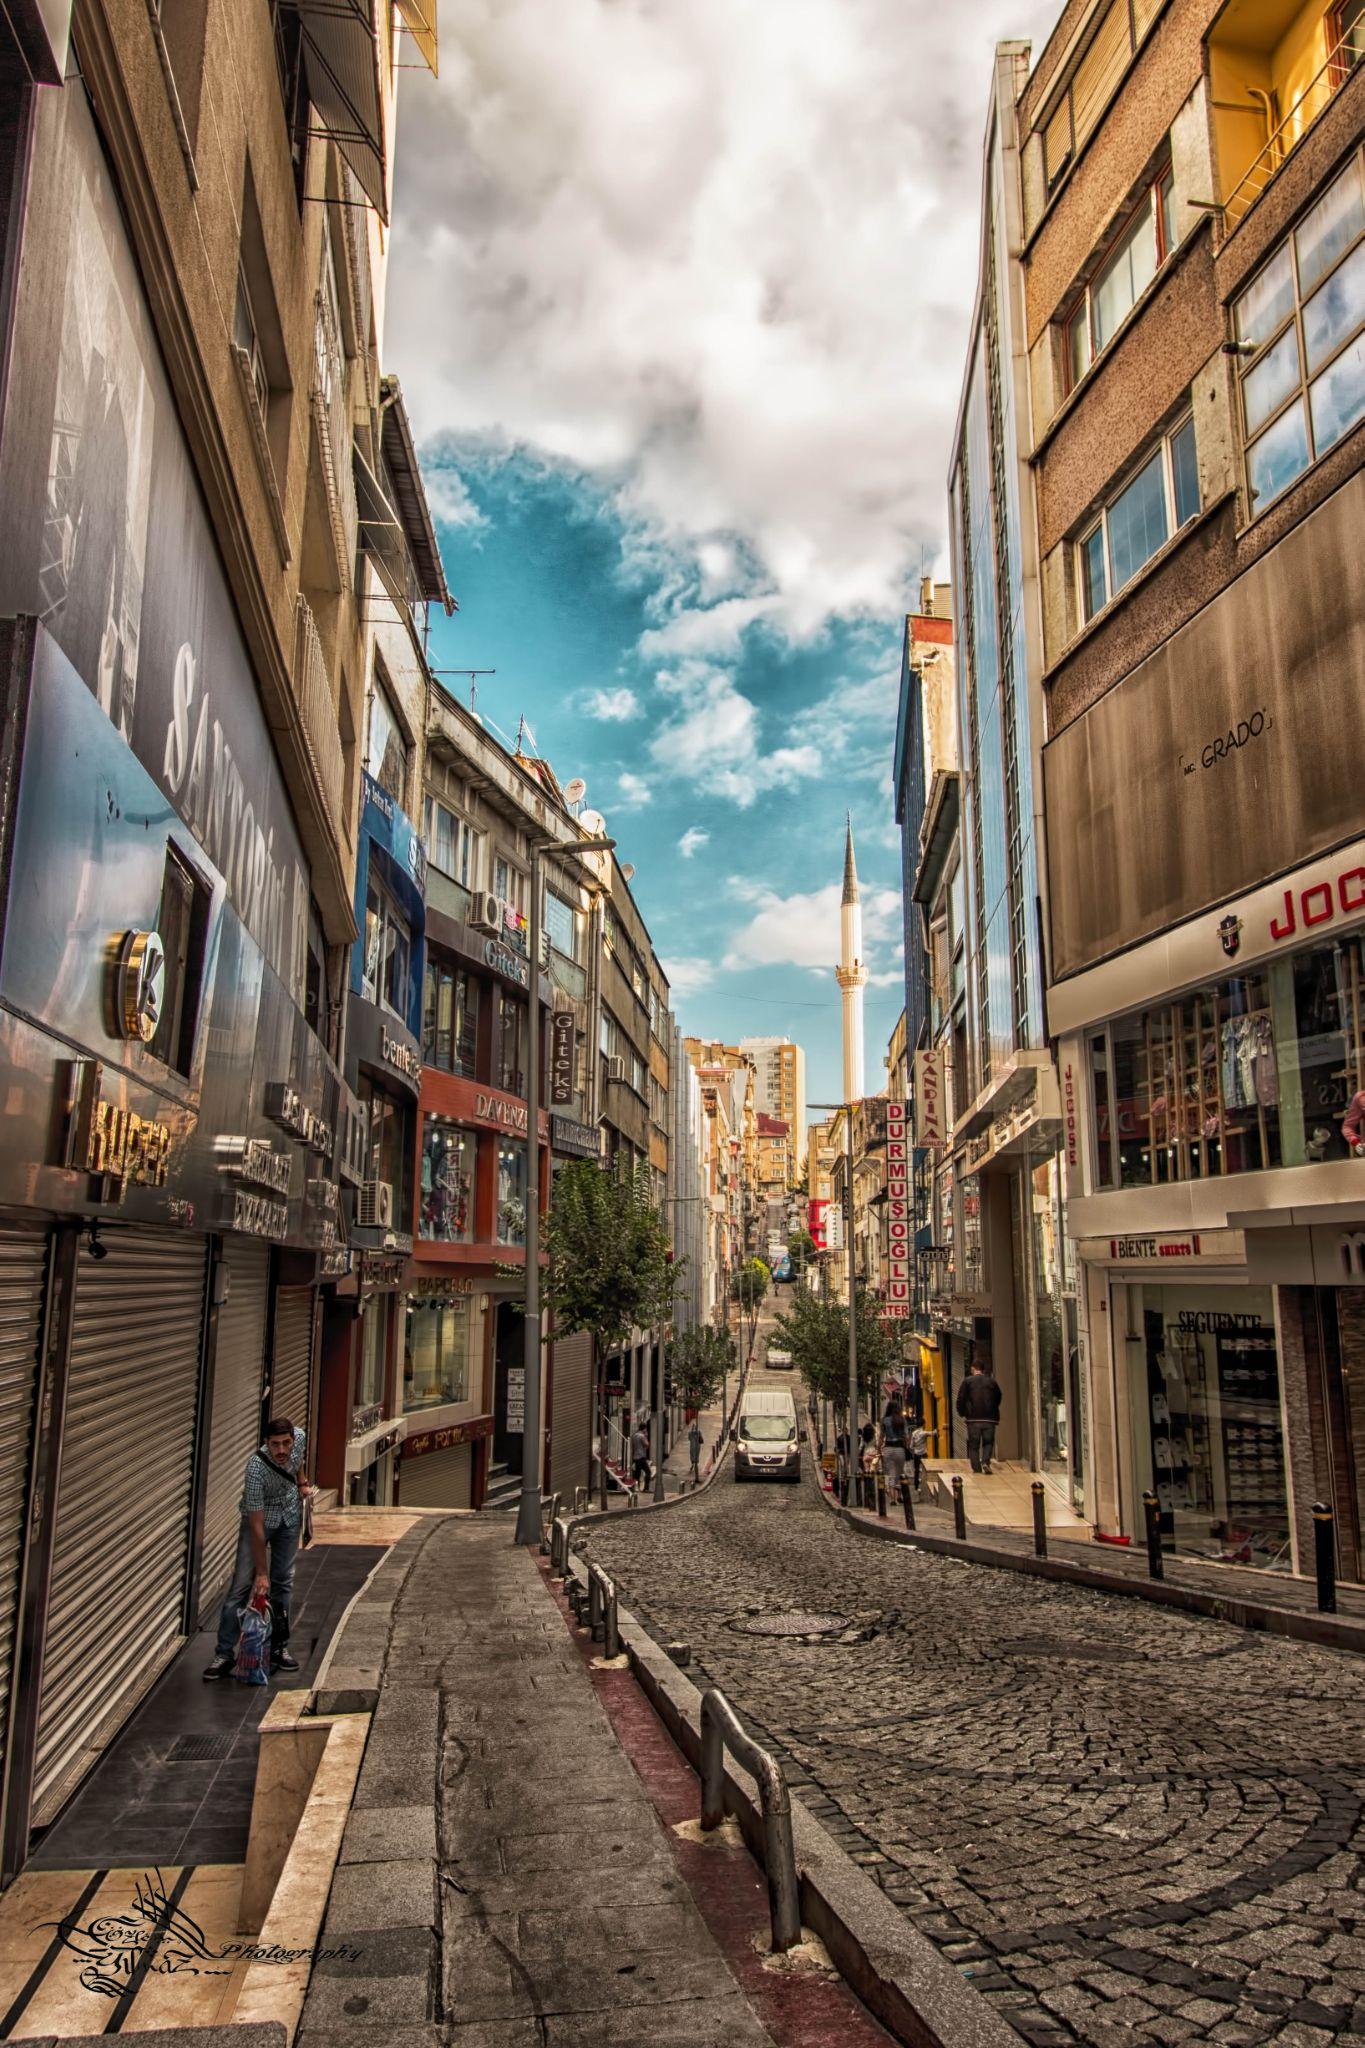 Untitled by Özlem Yılmaz